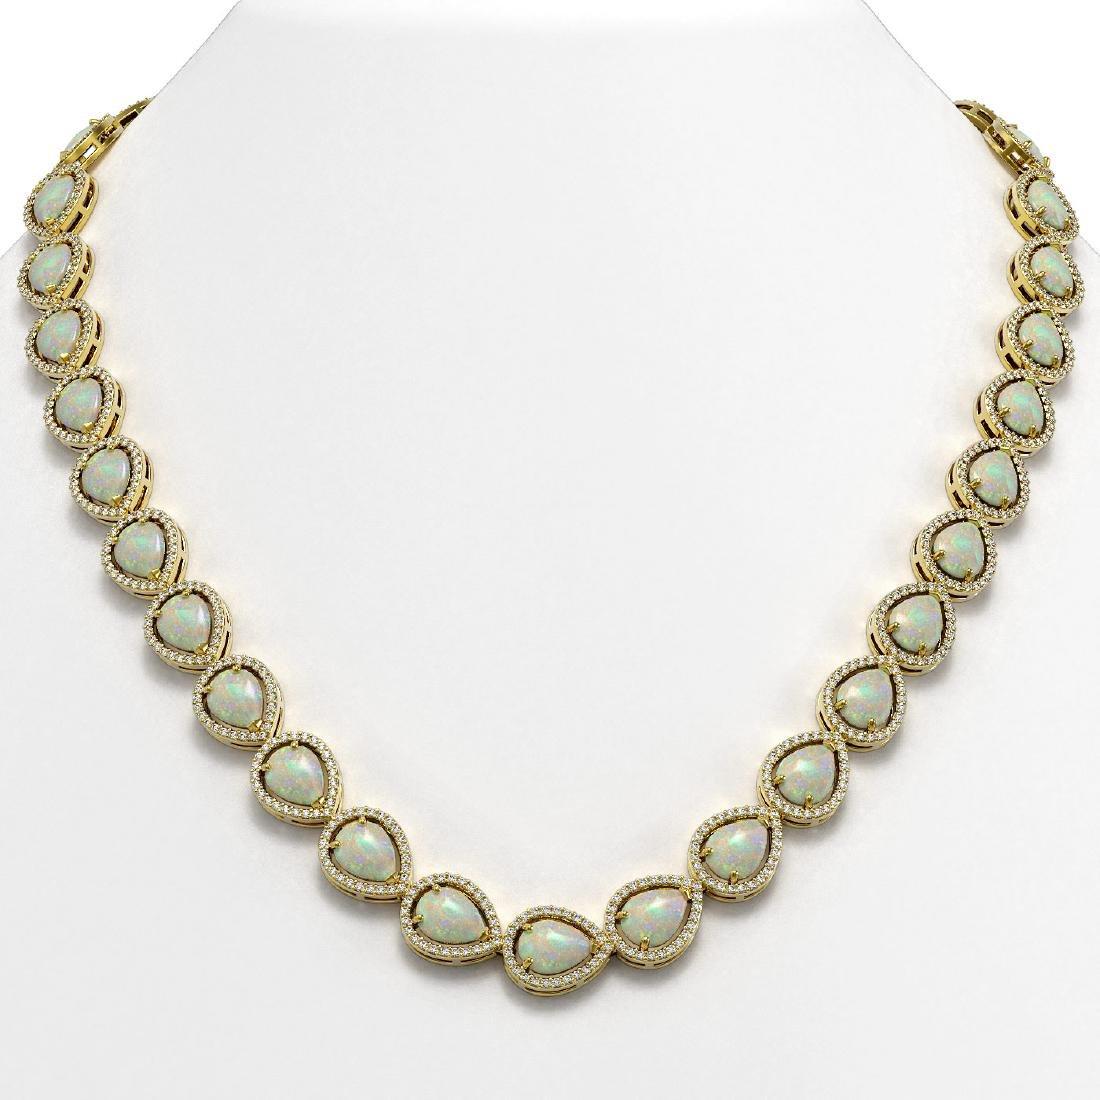 36.48 CTW Opal & Diamond Halo Necklace 10K Yellow Gold